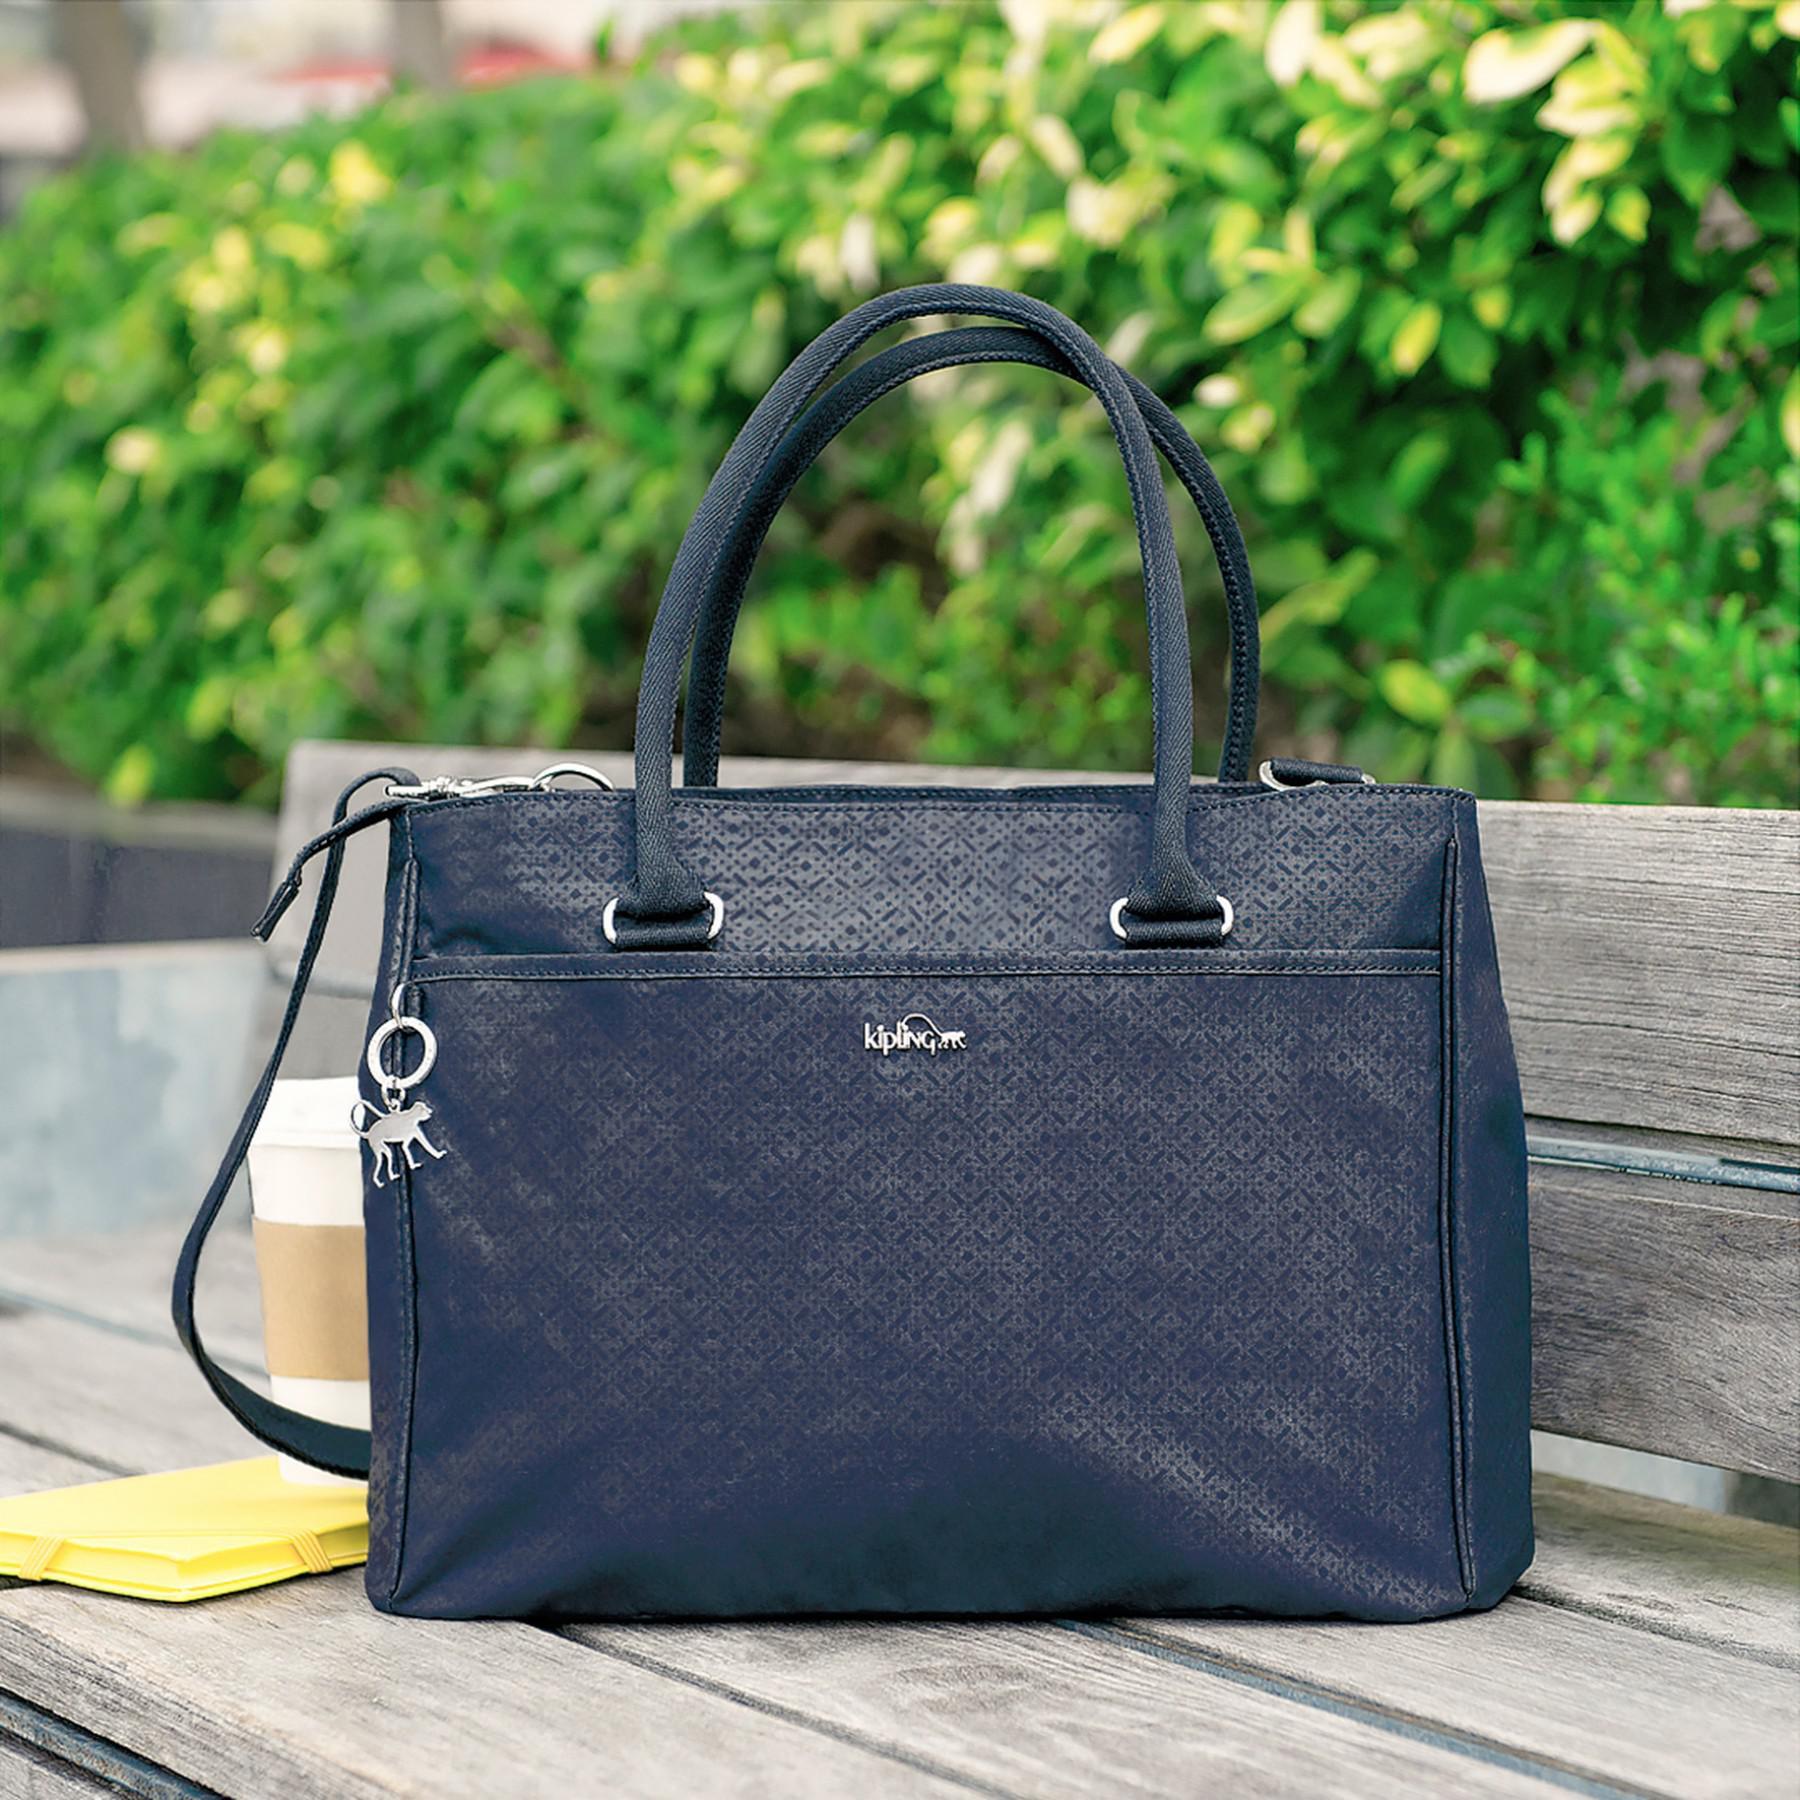 Kipling Womens Artego Laptop Bag (Basket Shimmer) Sale For Sale Cheap Big Discount Cheap Sale Inexpensive Inexpensive For Sale Free Shipping Cheapest Price rJZuqwZ